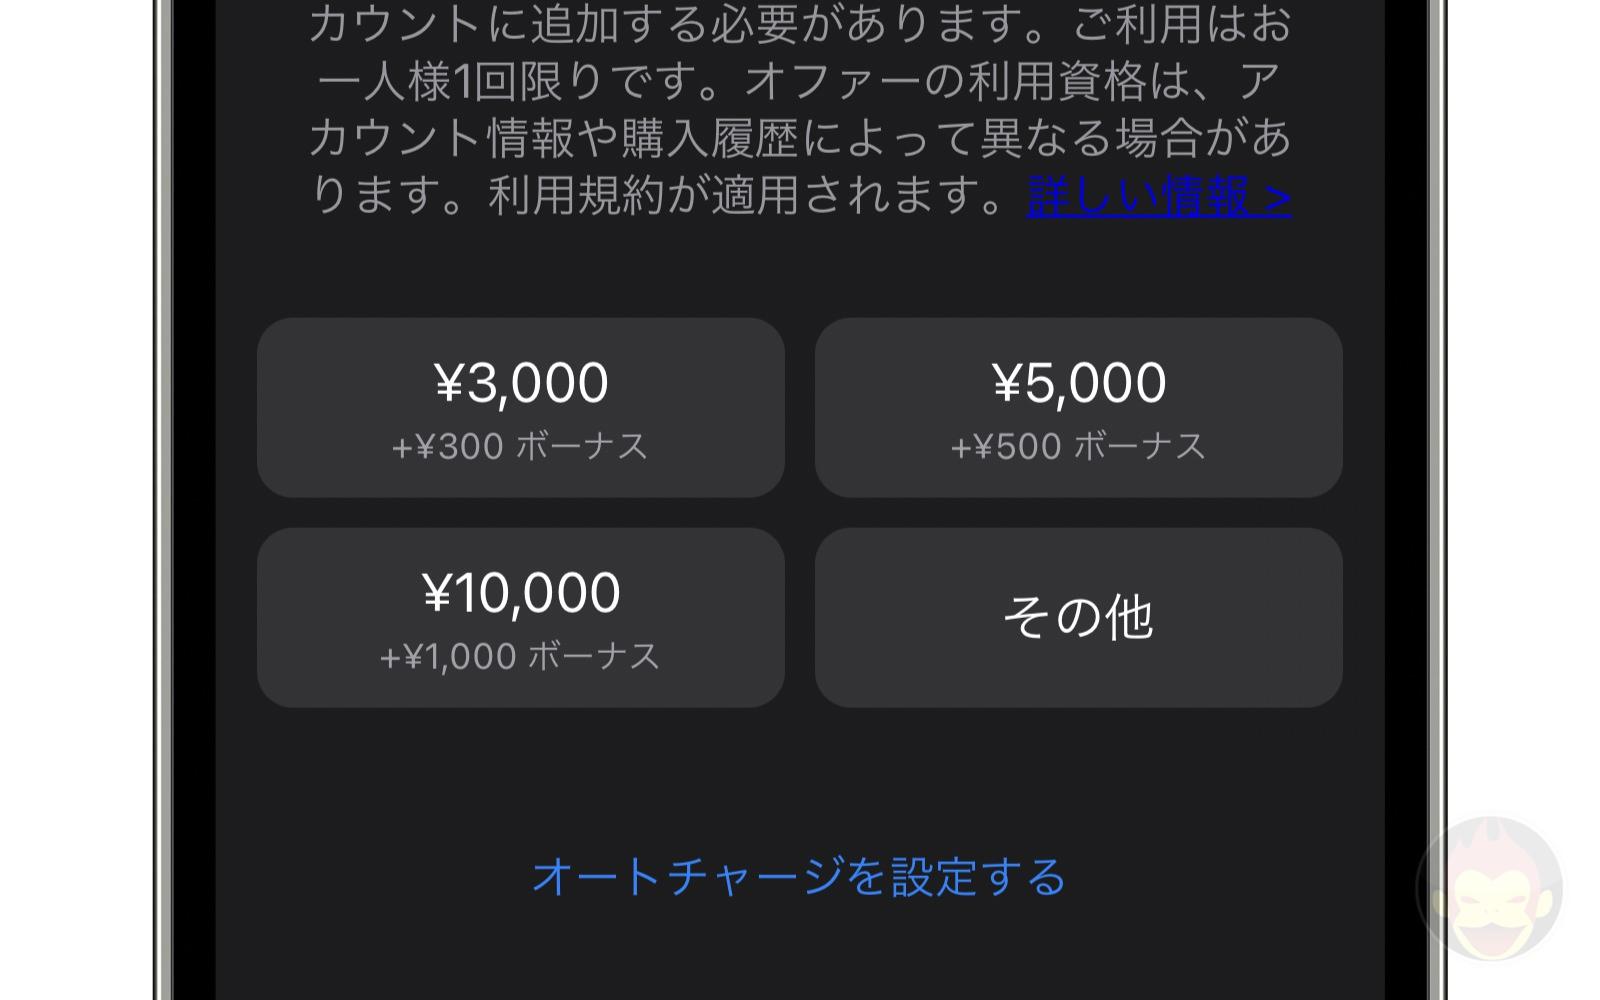 Auto Charge apple id 2